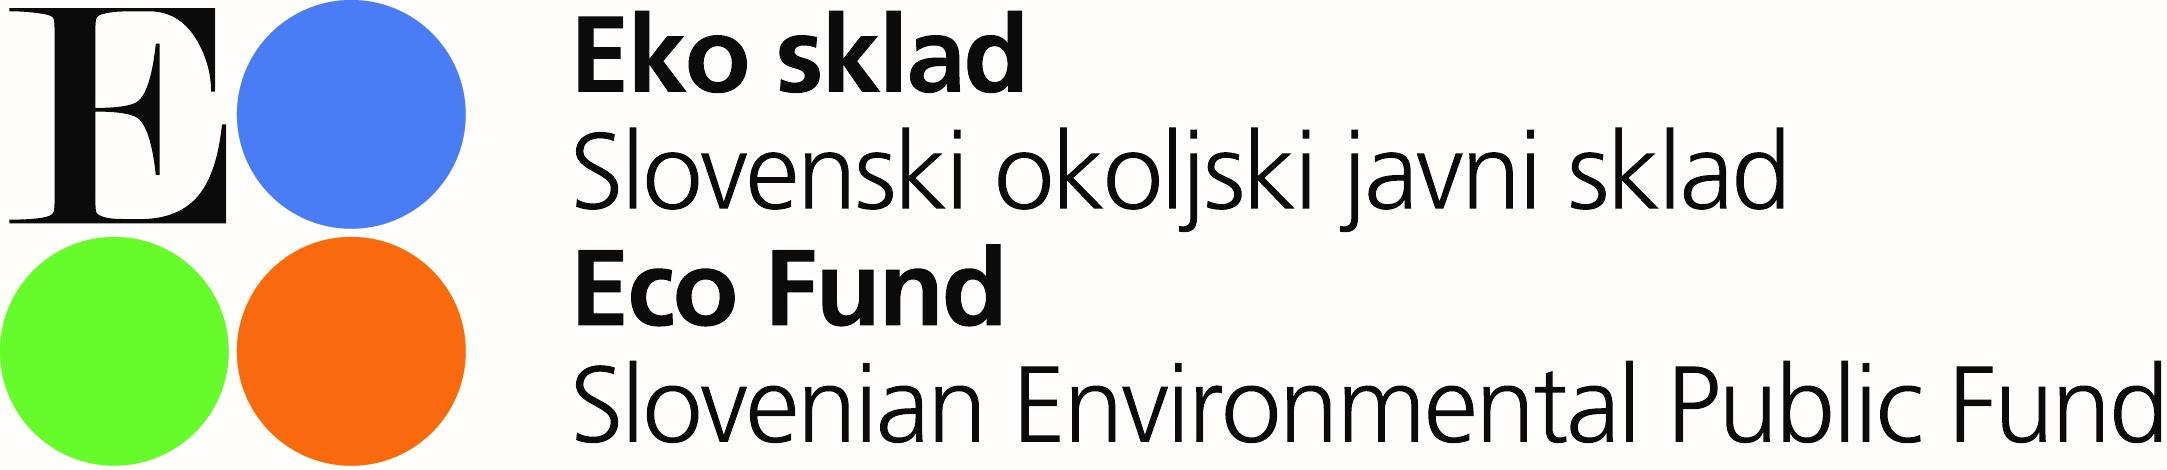 eko_sklad